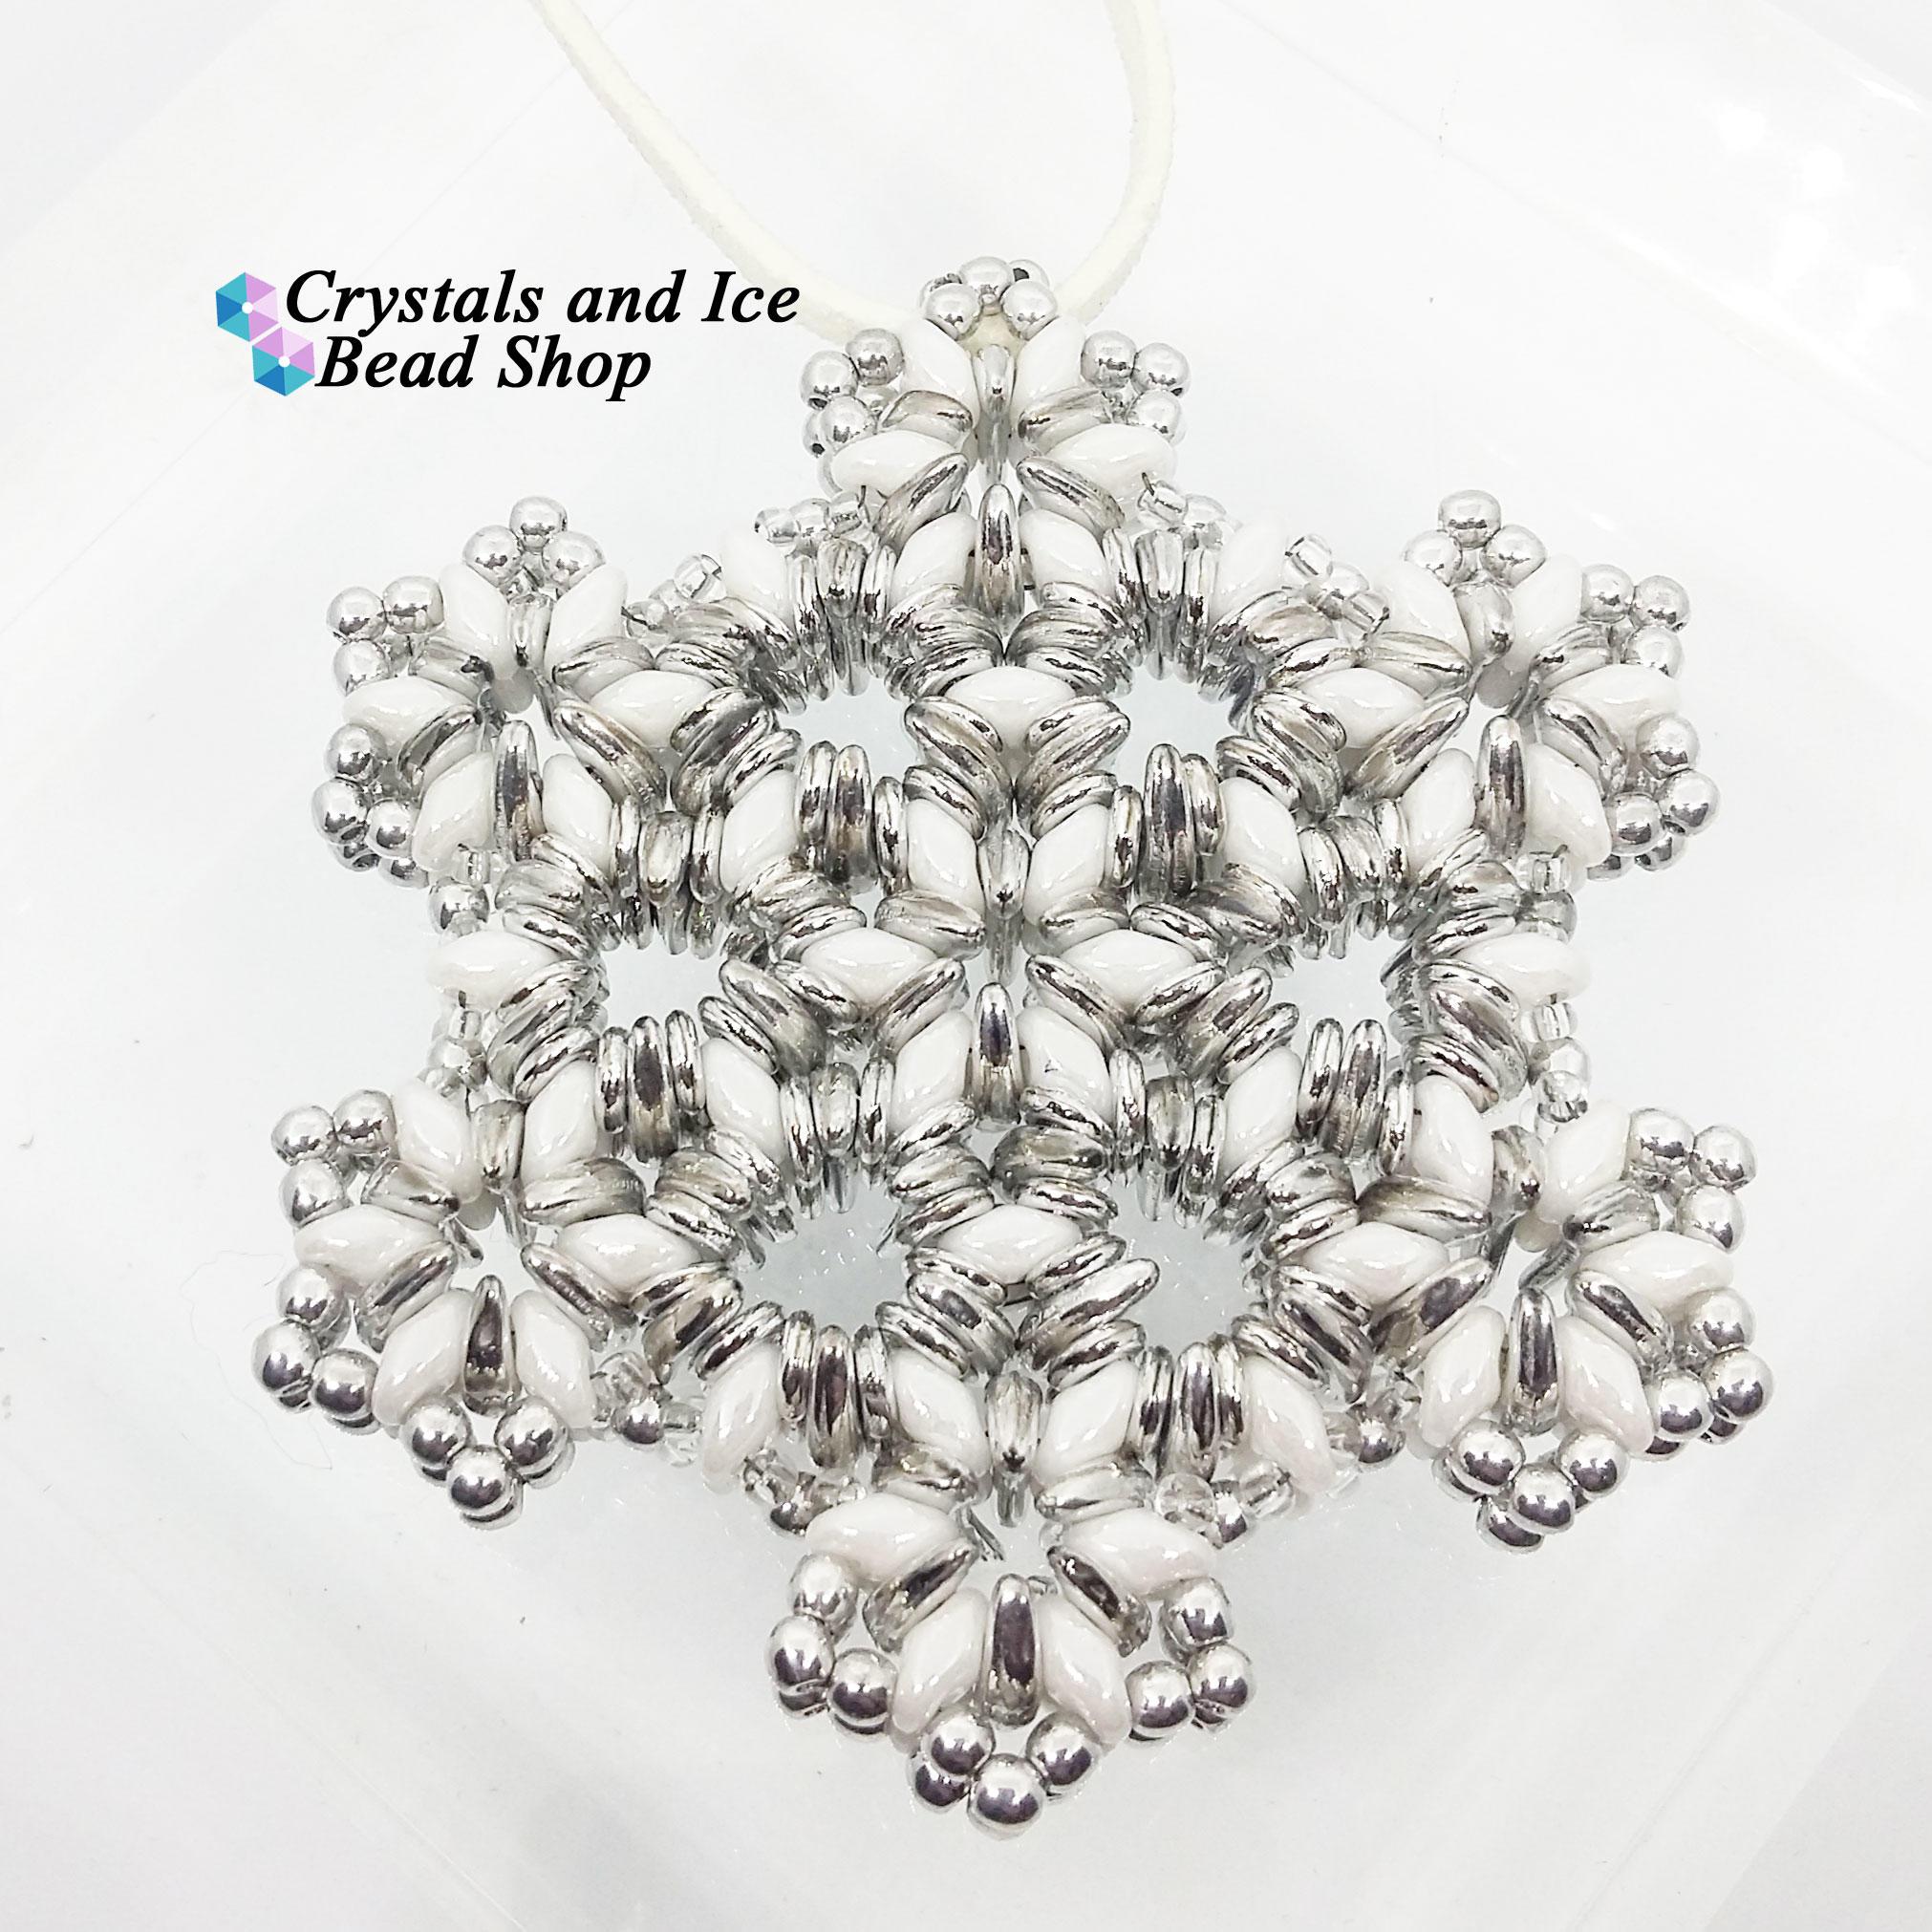 Christmas Snowflake Ornament Kit